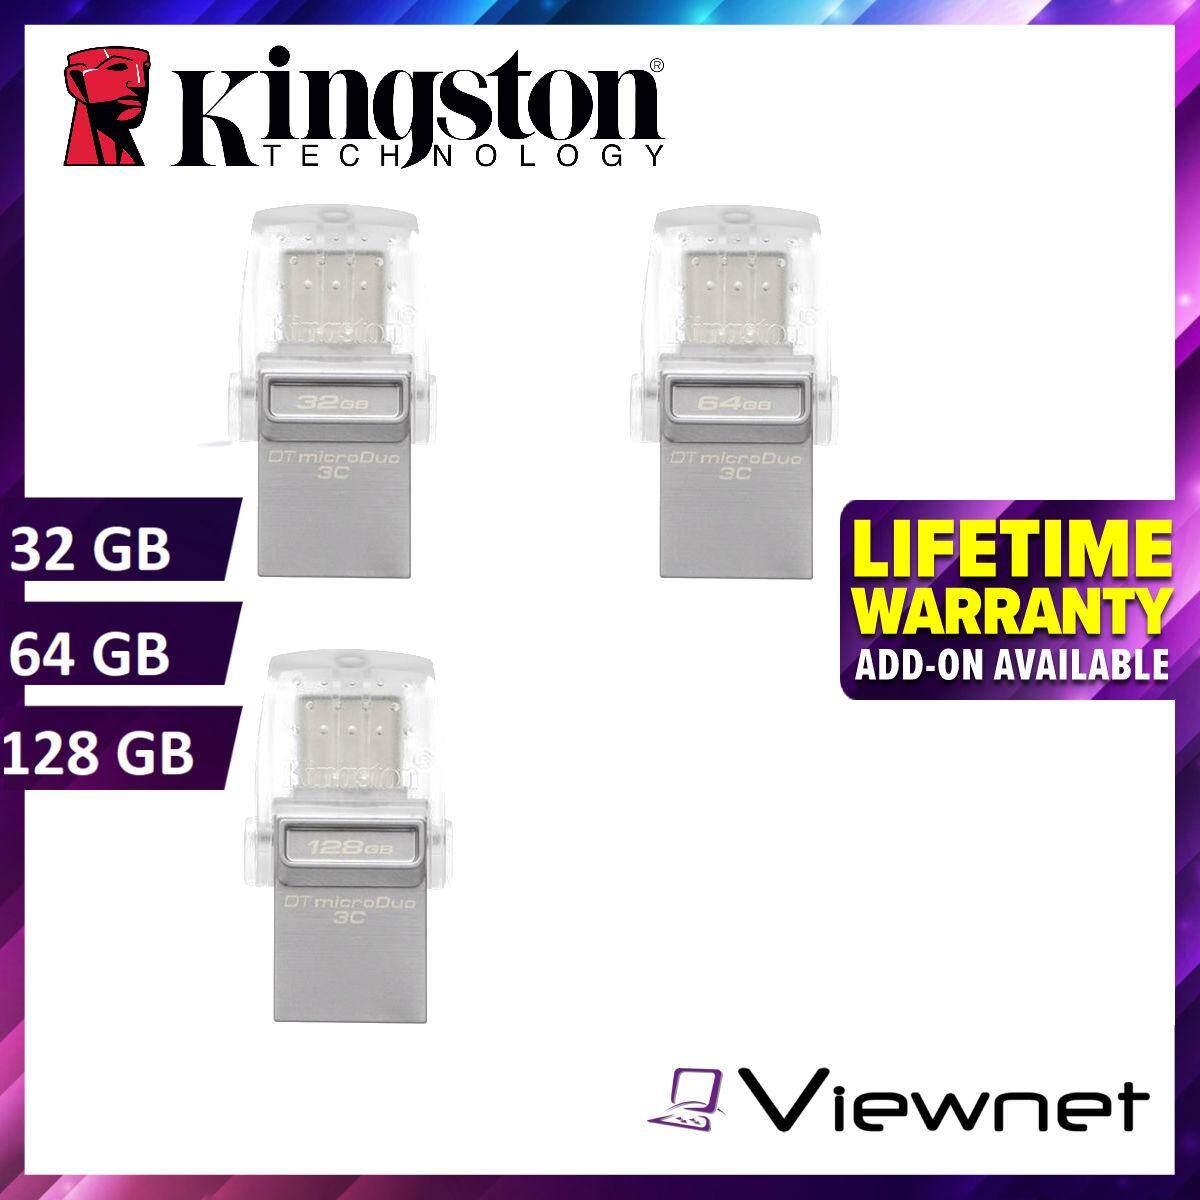 Kingston DataTraveler microDuo 32GB/64GB/128GB USB 3C Flash Drive (DTDUO3C/32GB/64GB/128GB) Pendrive